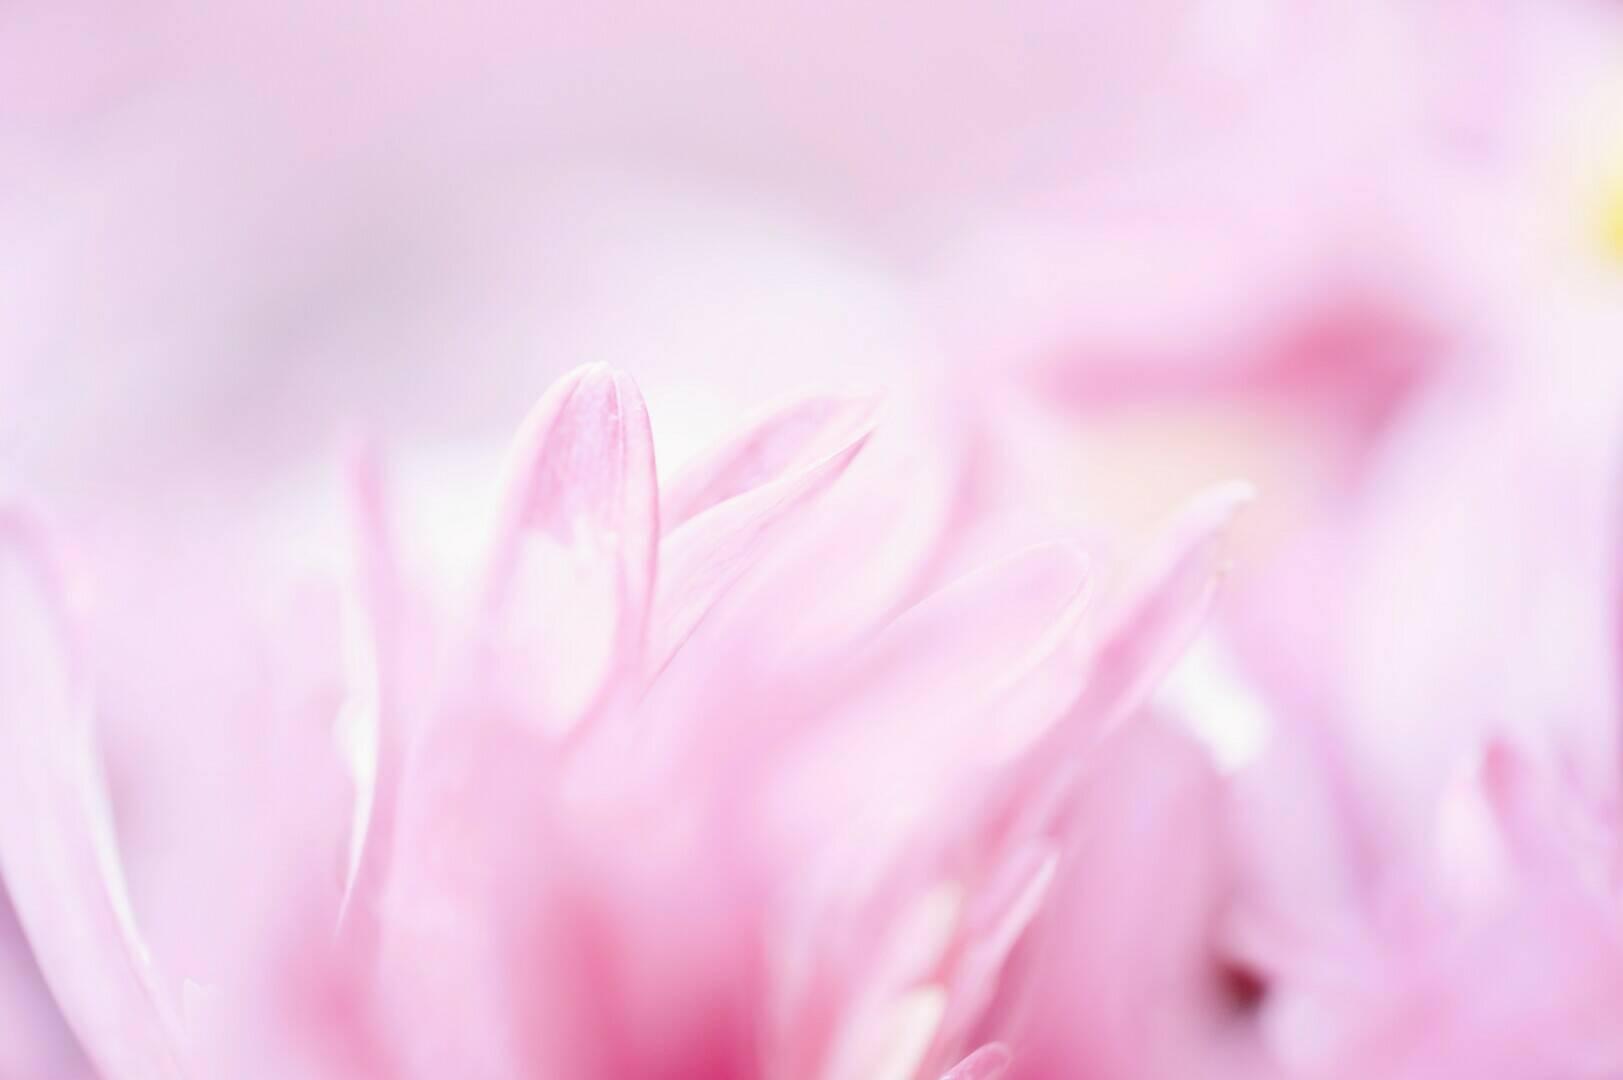 plant-flower-petalxx-liu.jpg